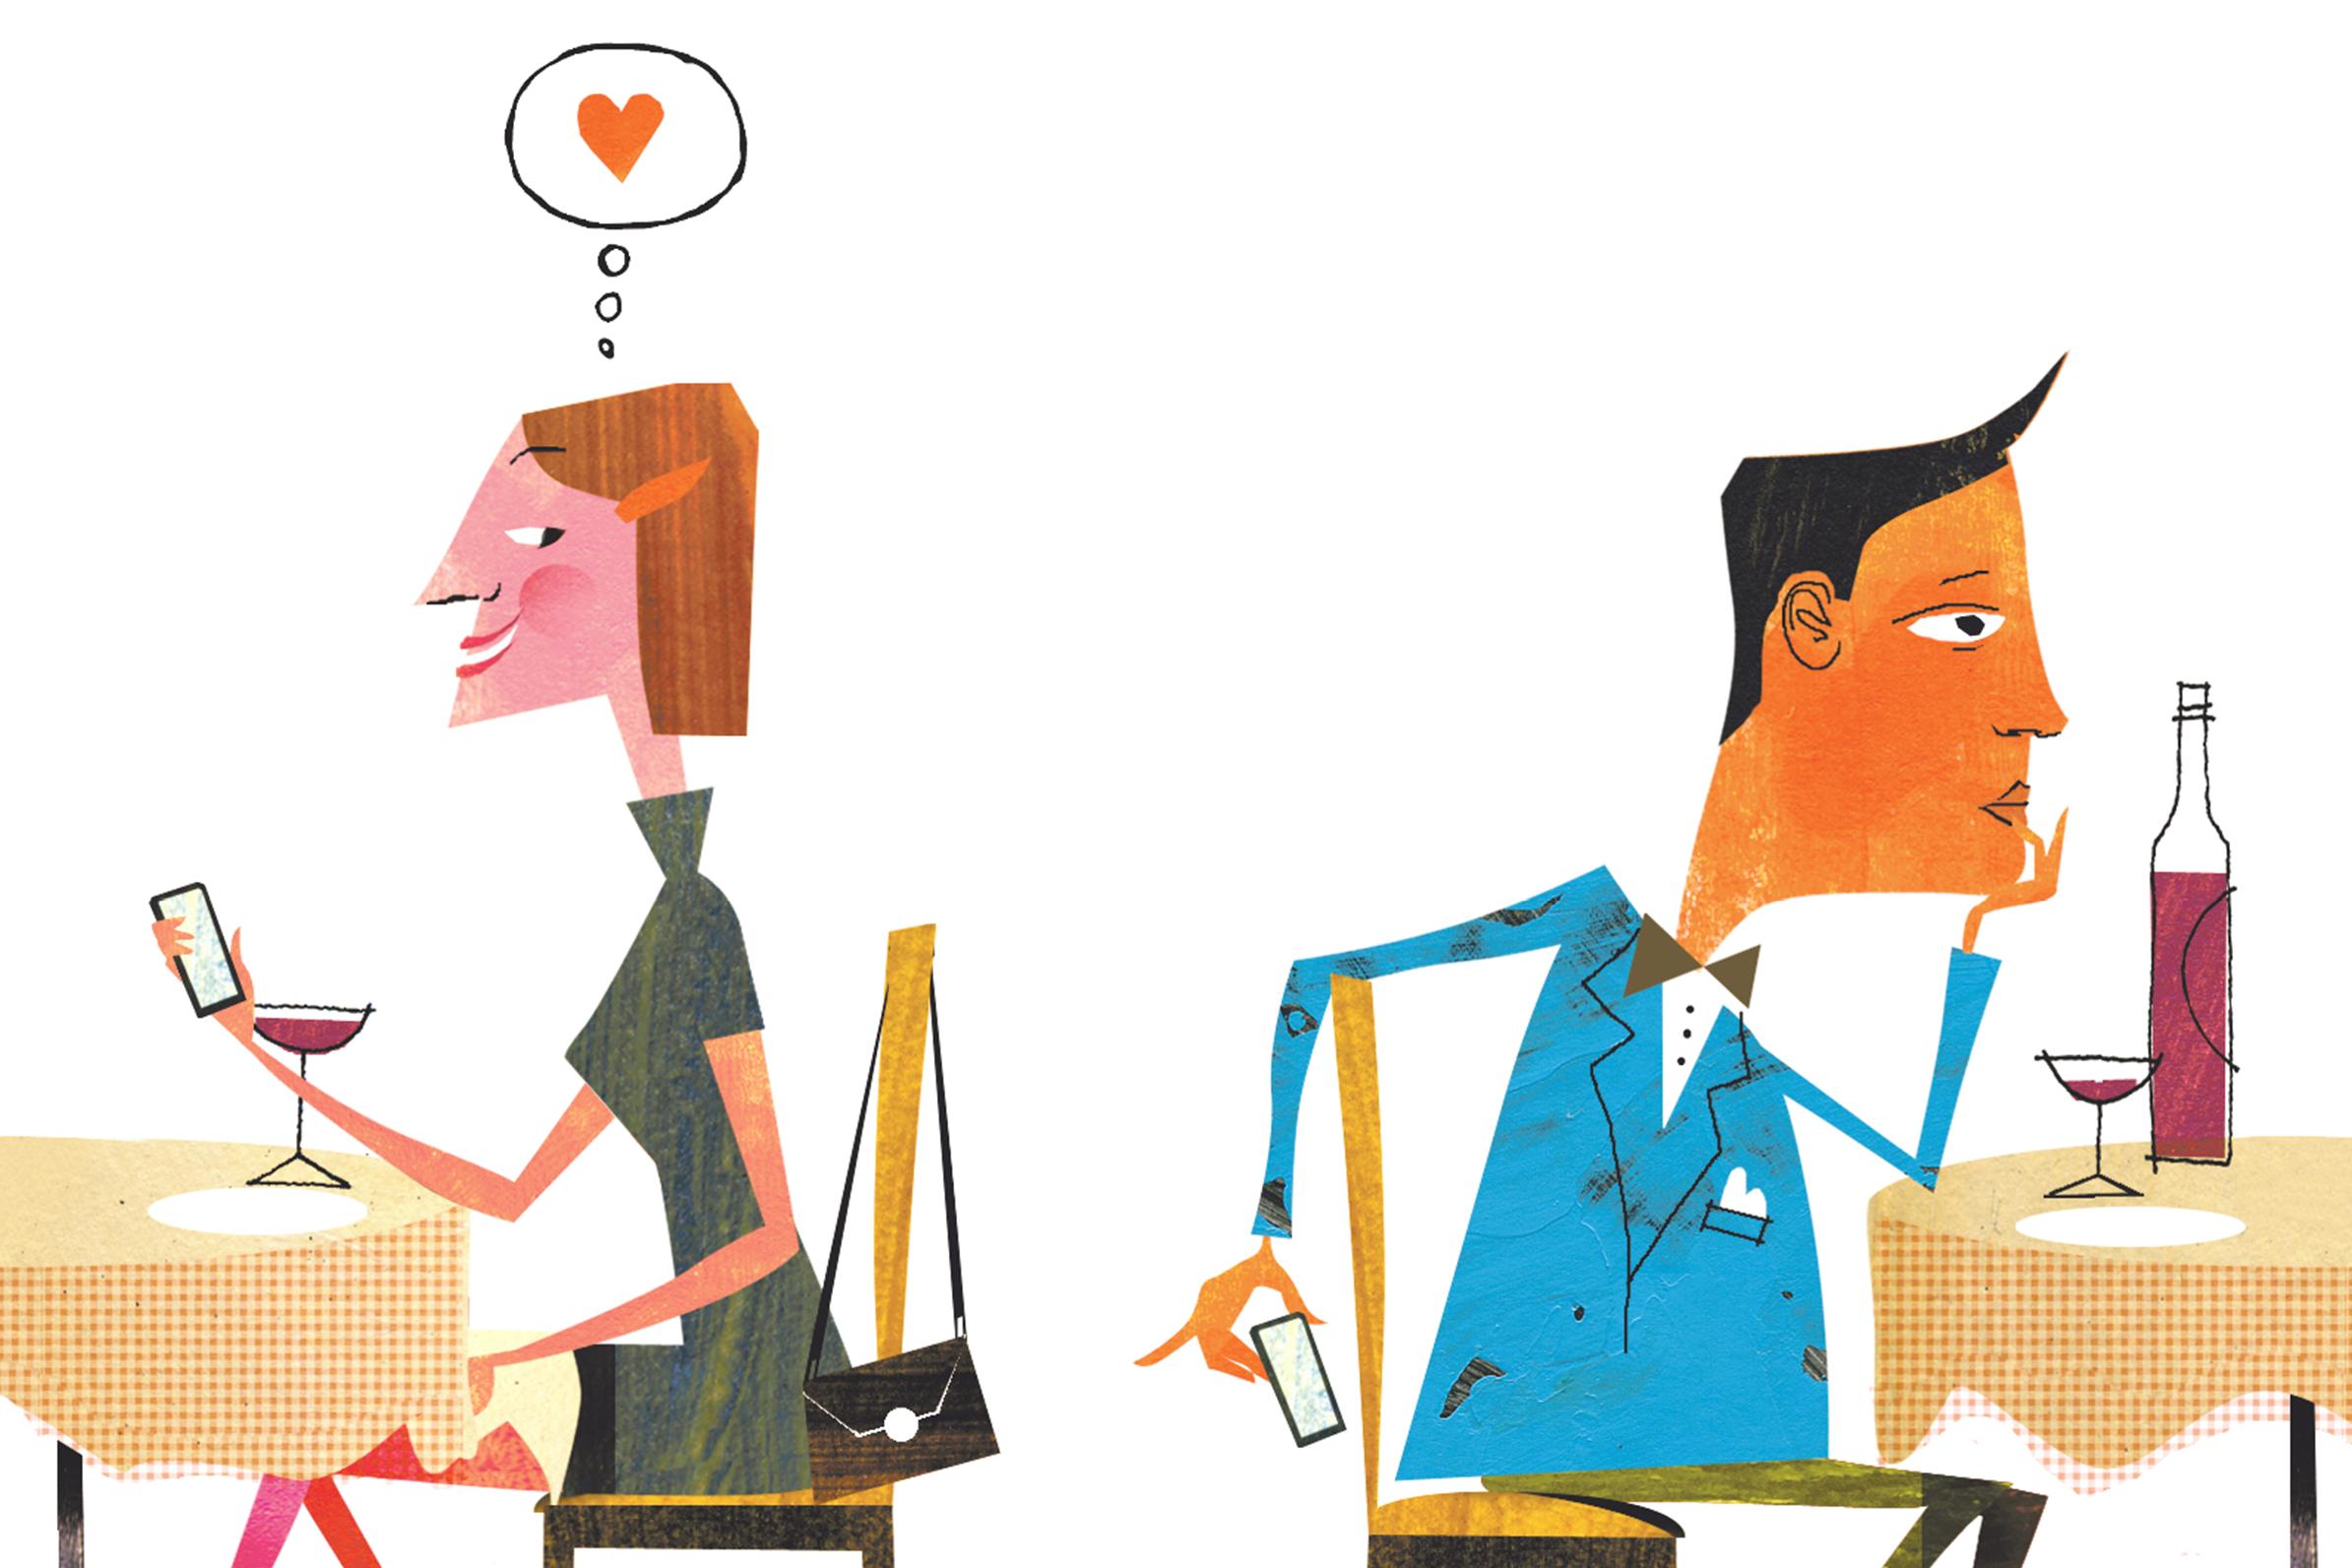 dating networking websites